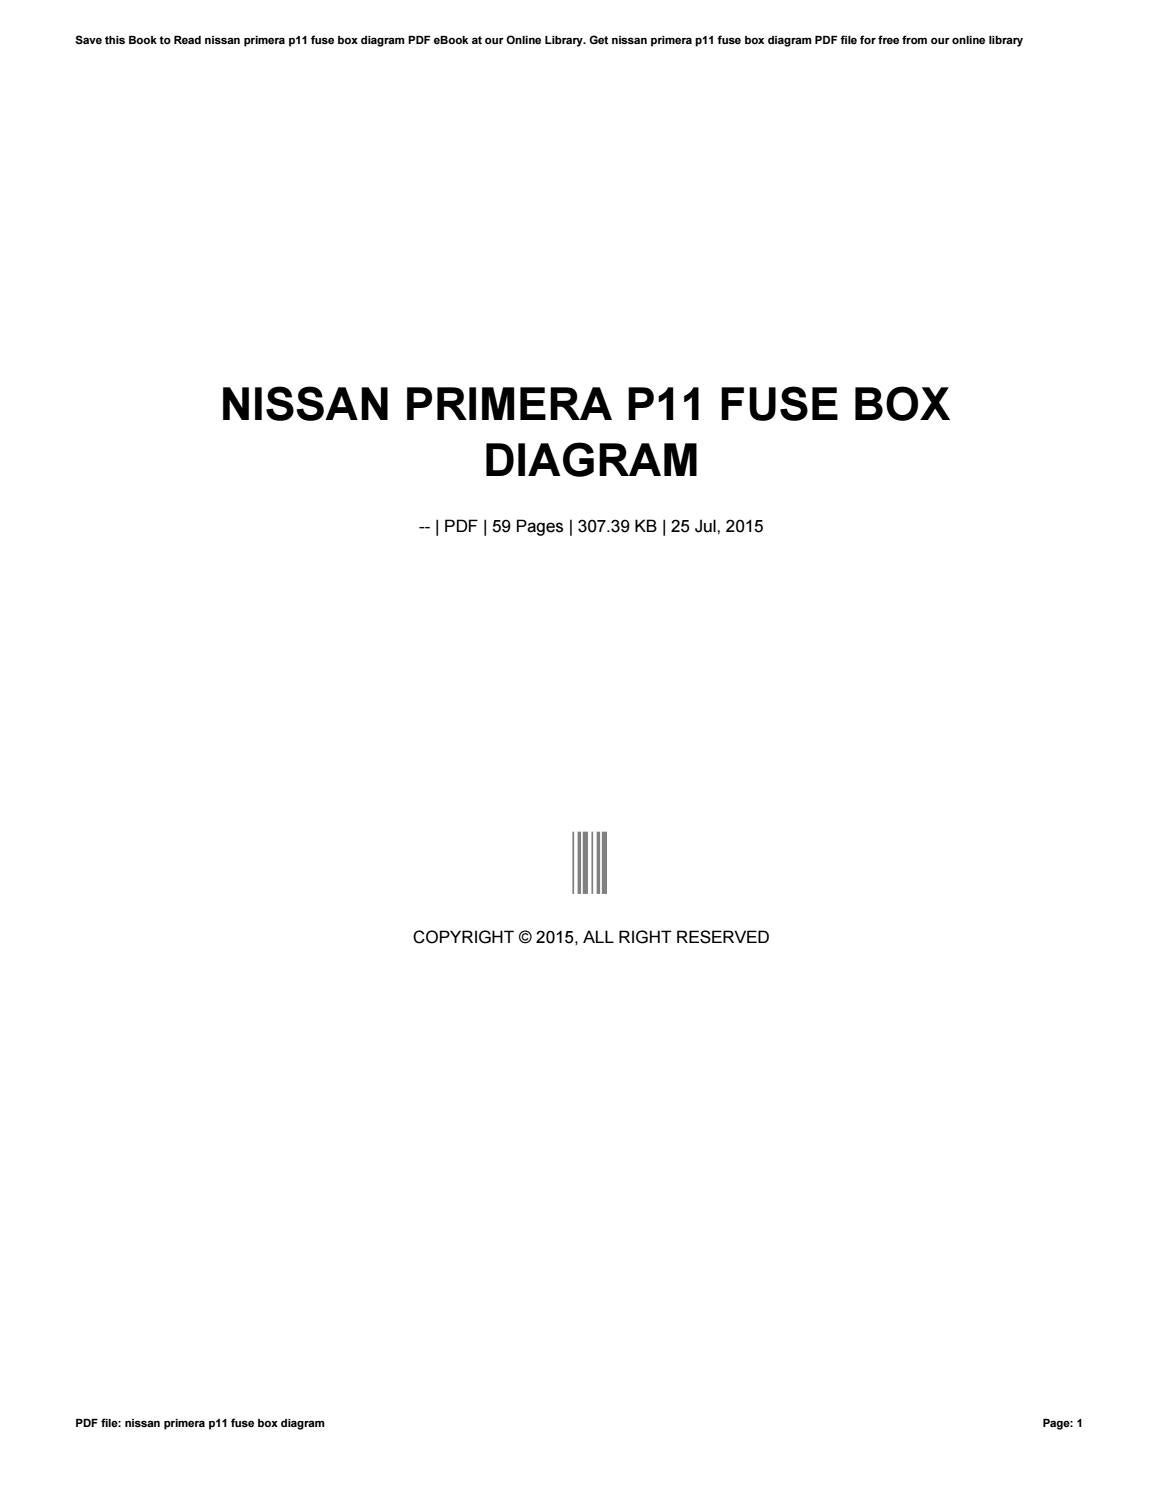 Nissan Primera P11 Fuse Box Diagram By Smallker79 Issuu Main